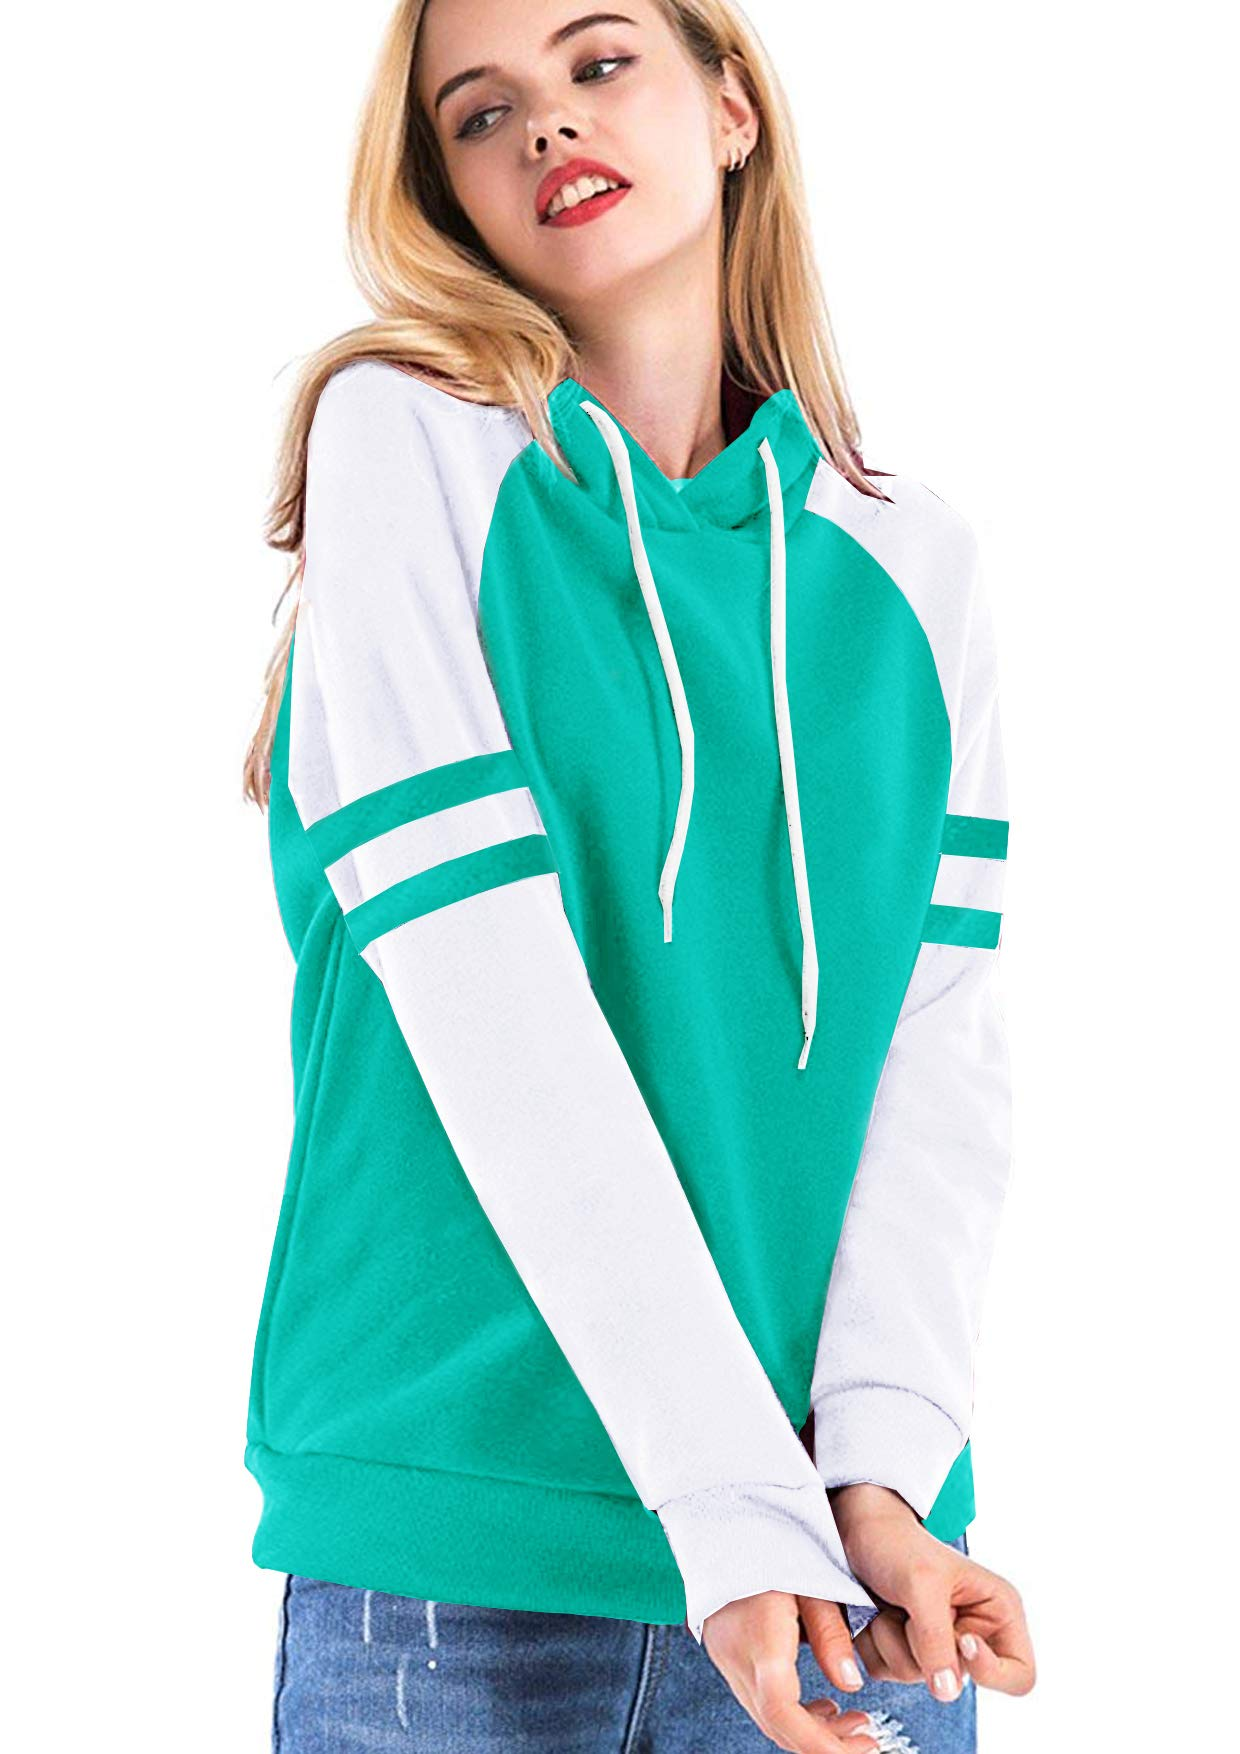 Yidarton Women's Color Block Long Sleeve T Shirt Casual Round Neck Tunic Tops Hoodies(Green,M)